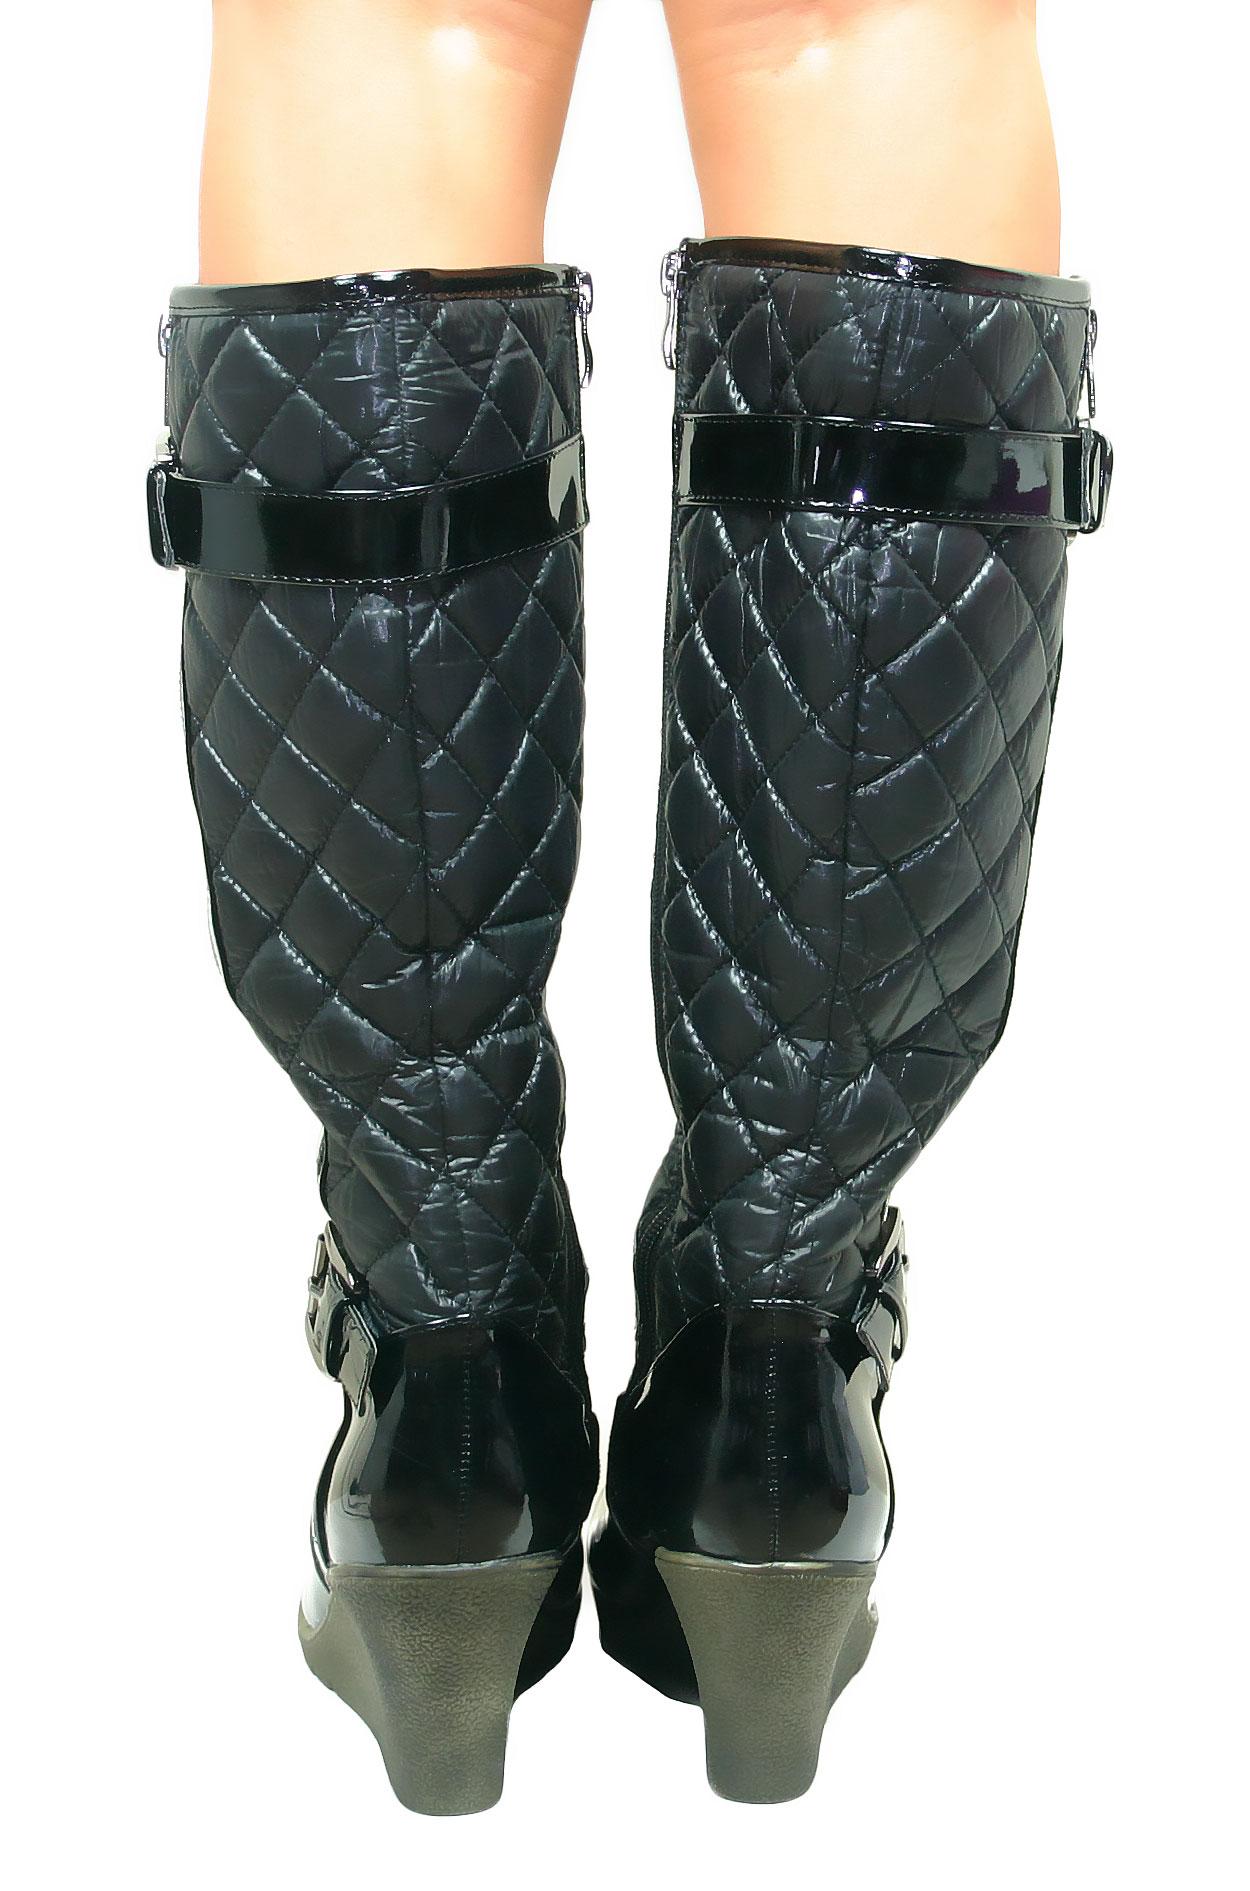 Womens-Ladies-Knee-High-Wedge-Heel-Black-Padded-Quilted-Boots